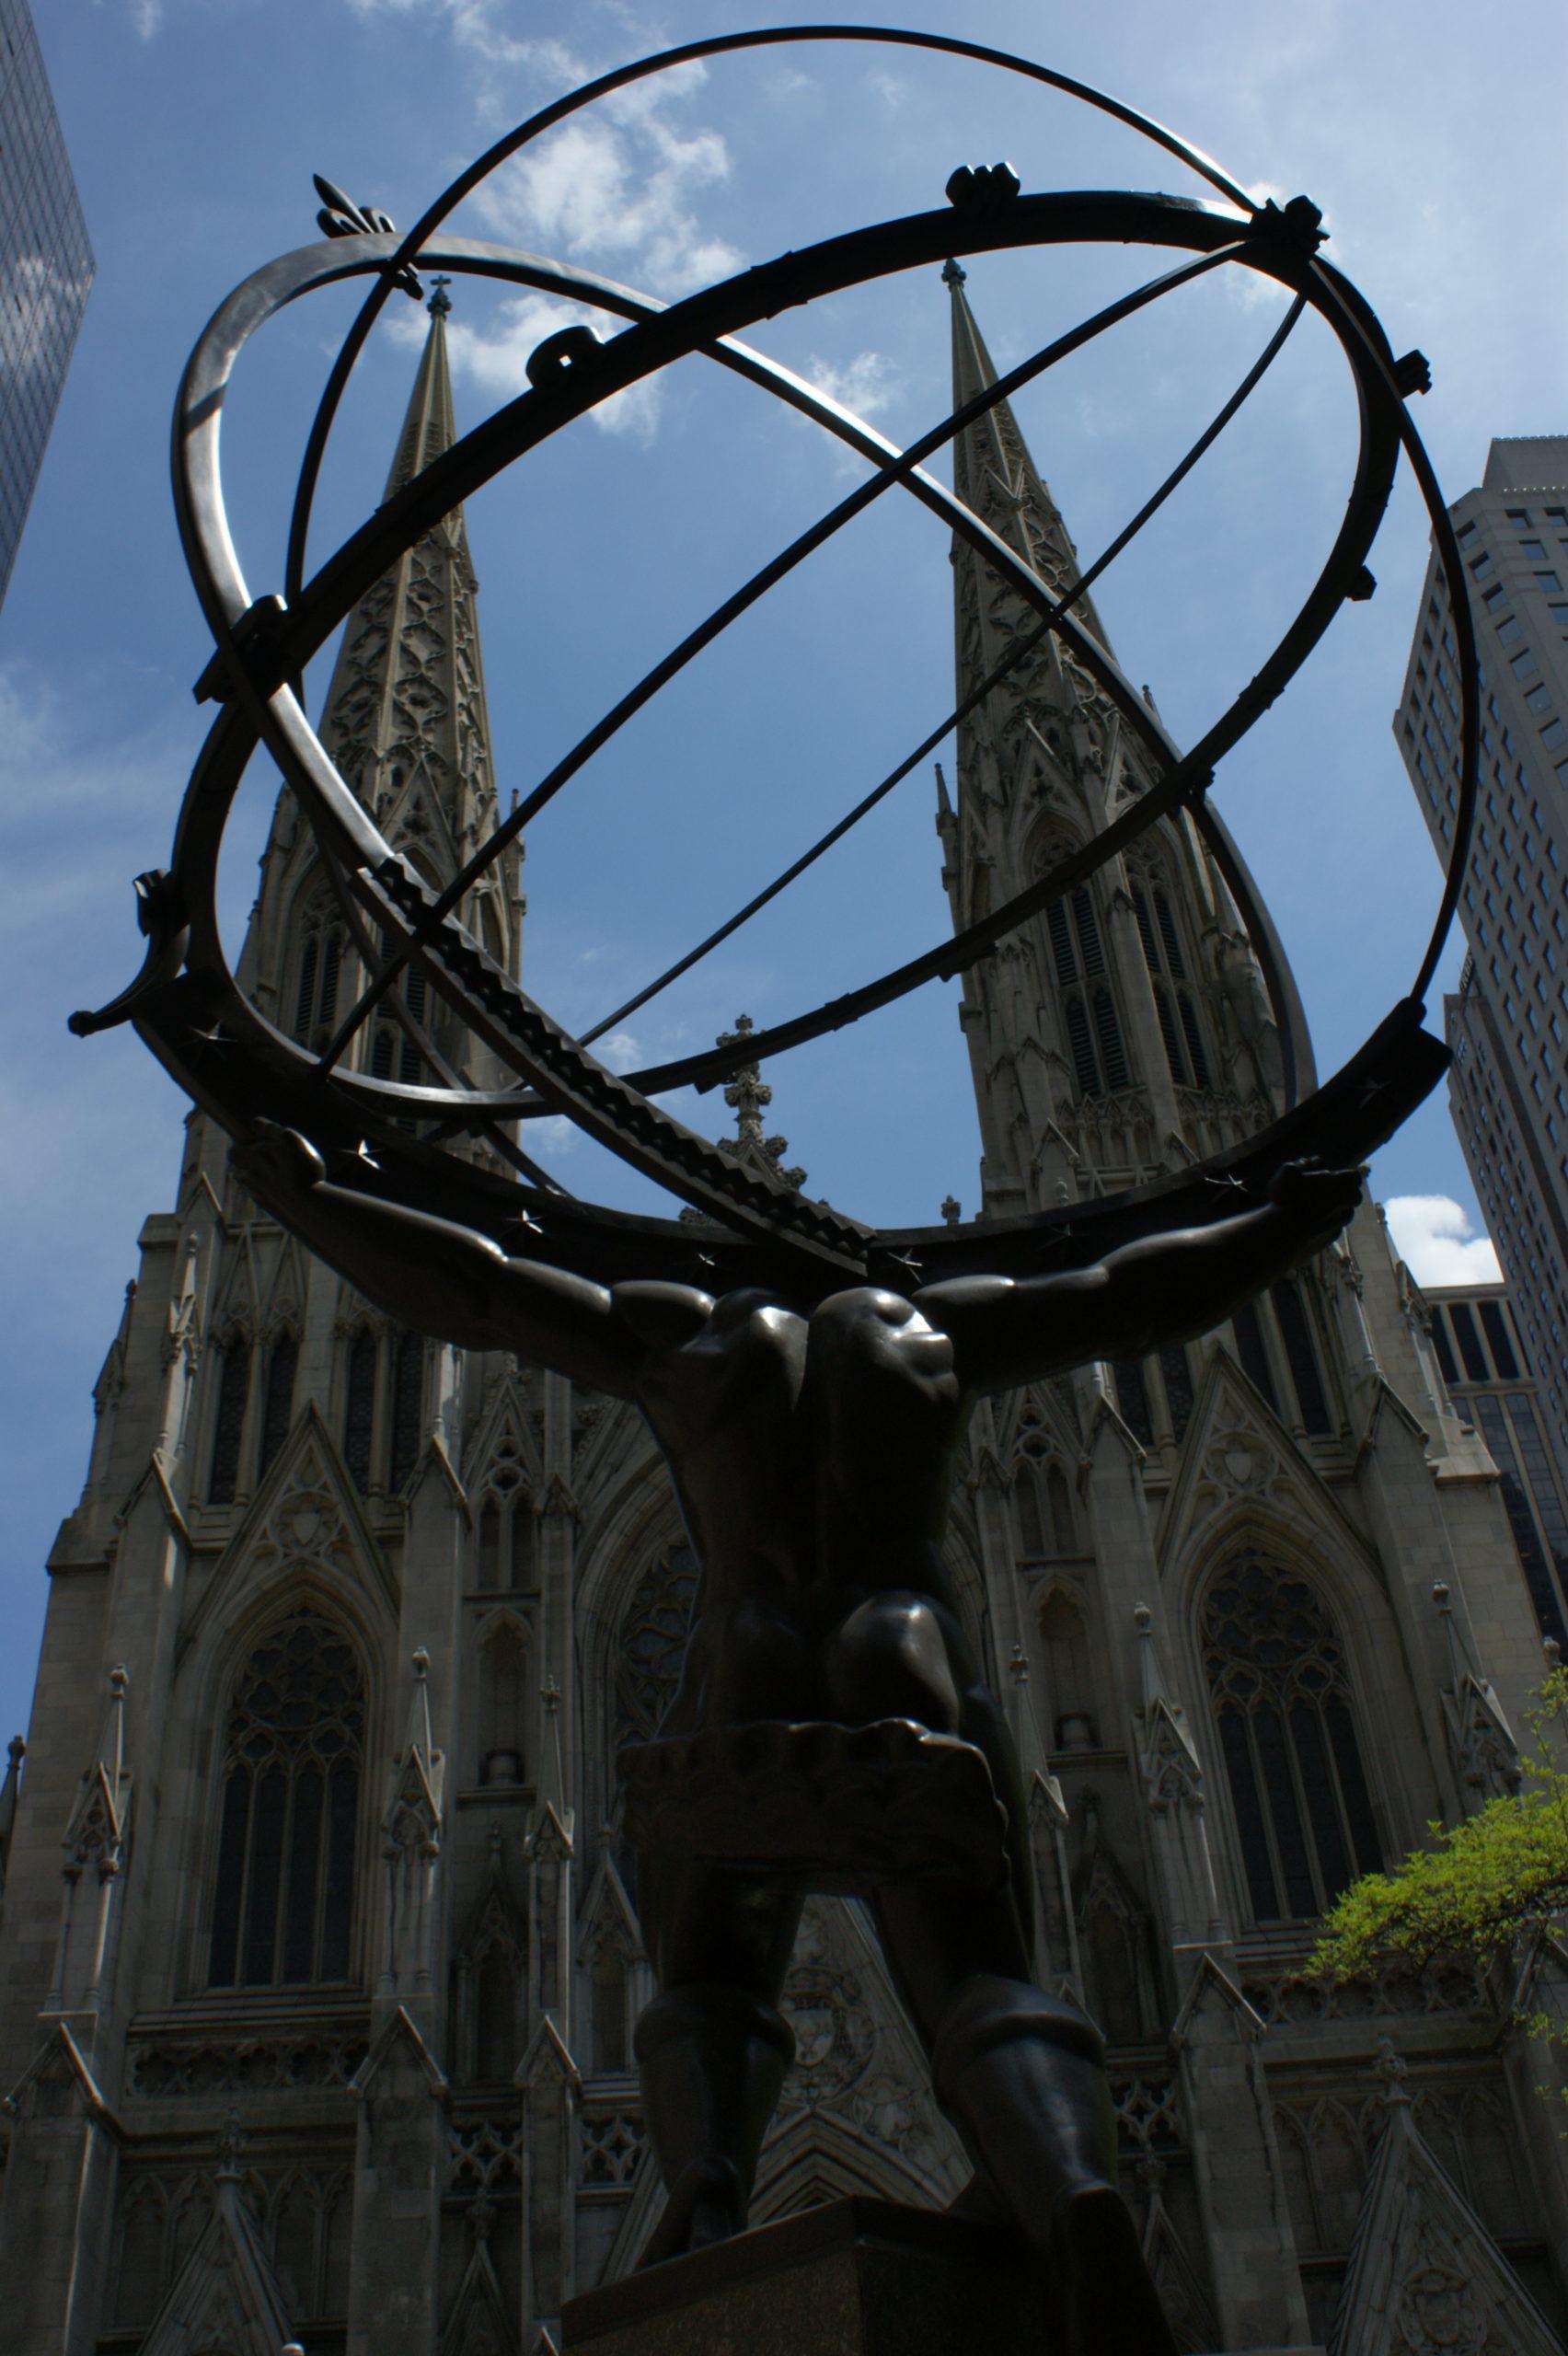 Katedra św. Patryka st. Patrick's Cathedral